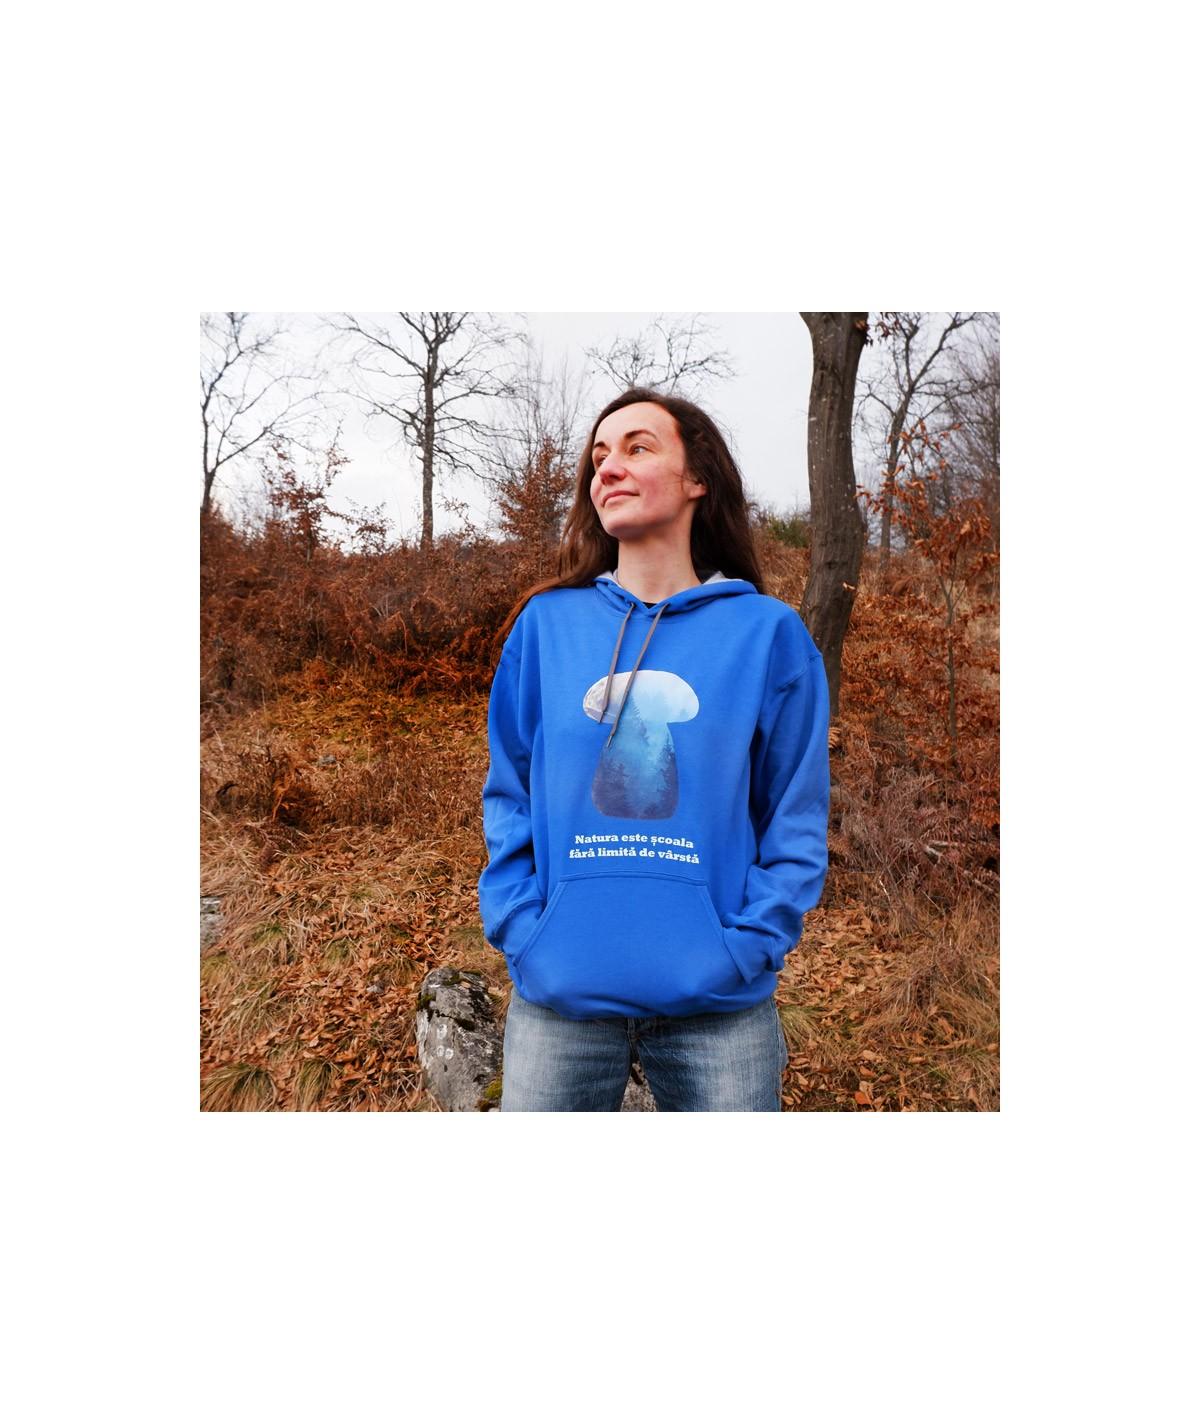 Hanorac unisex albastru ciuperci